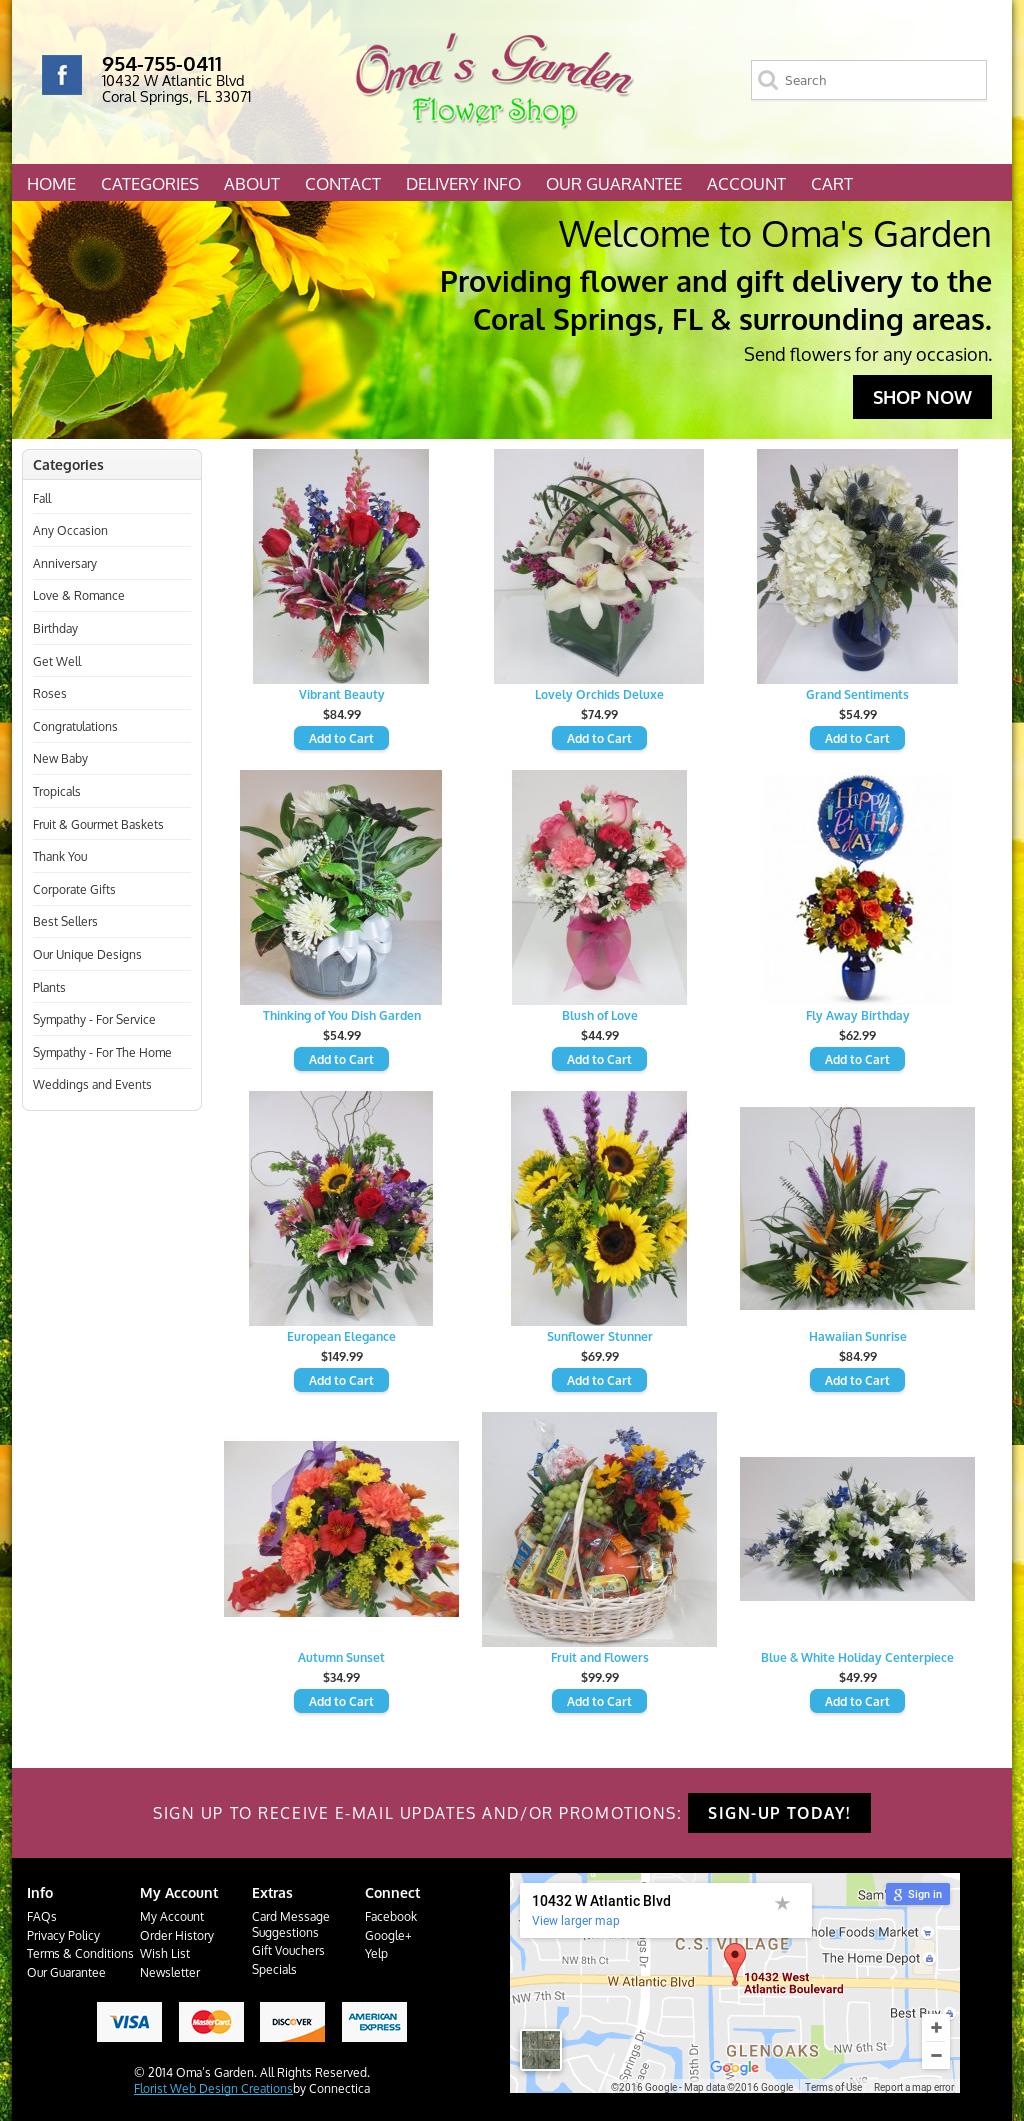 Omas garden flower shop competitors revenue and employees owler omas garden flower shop competitors revenue and employees owler company profile mightylinksfo